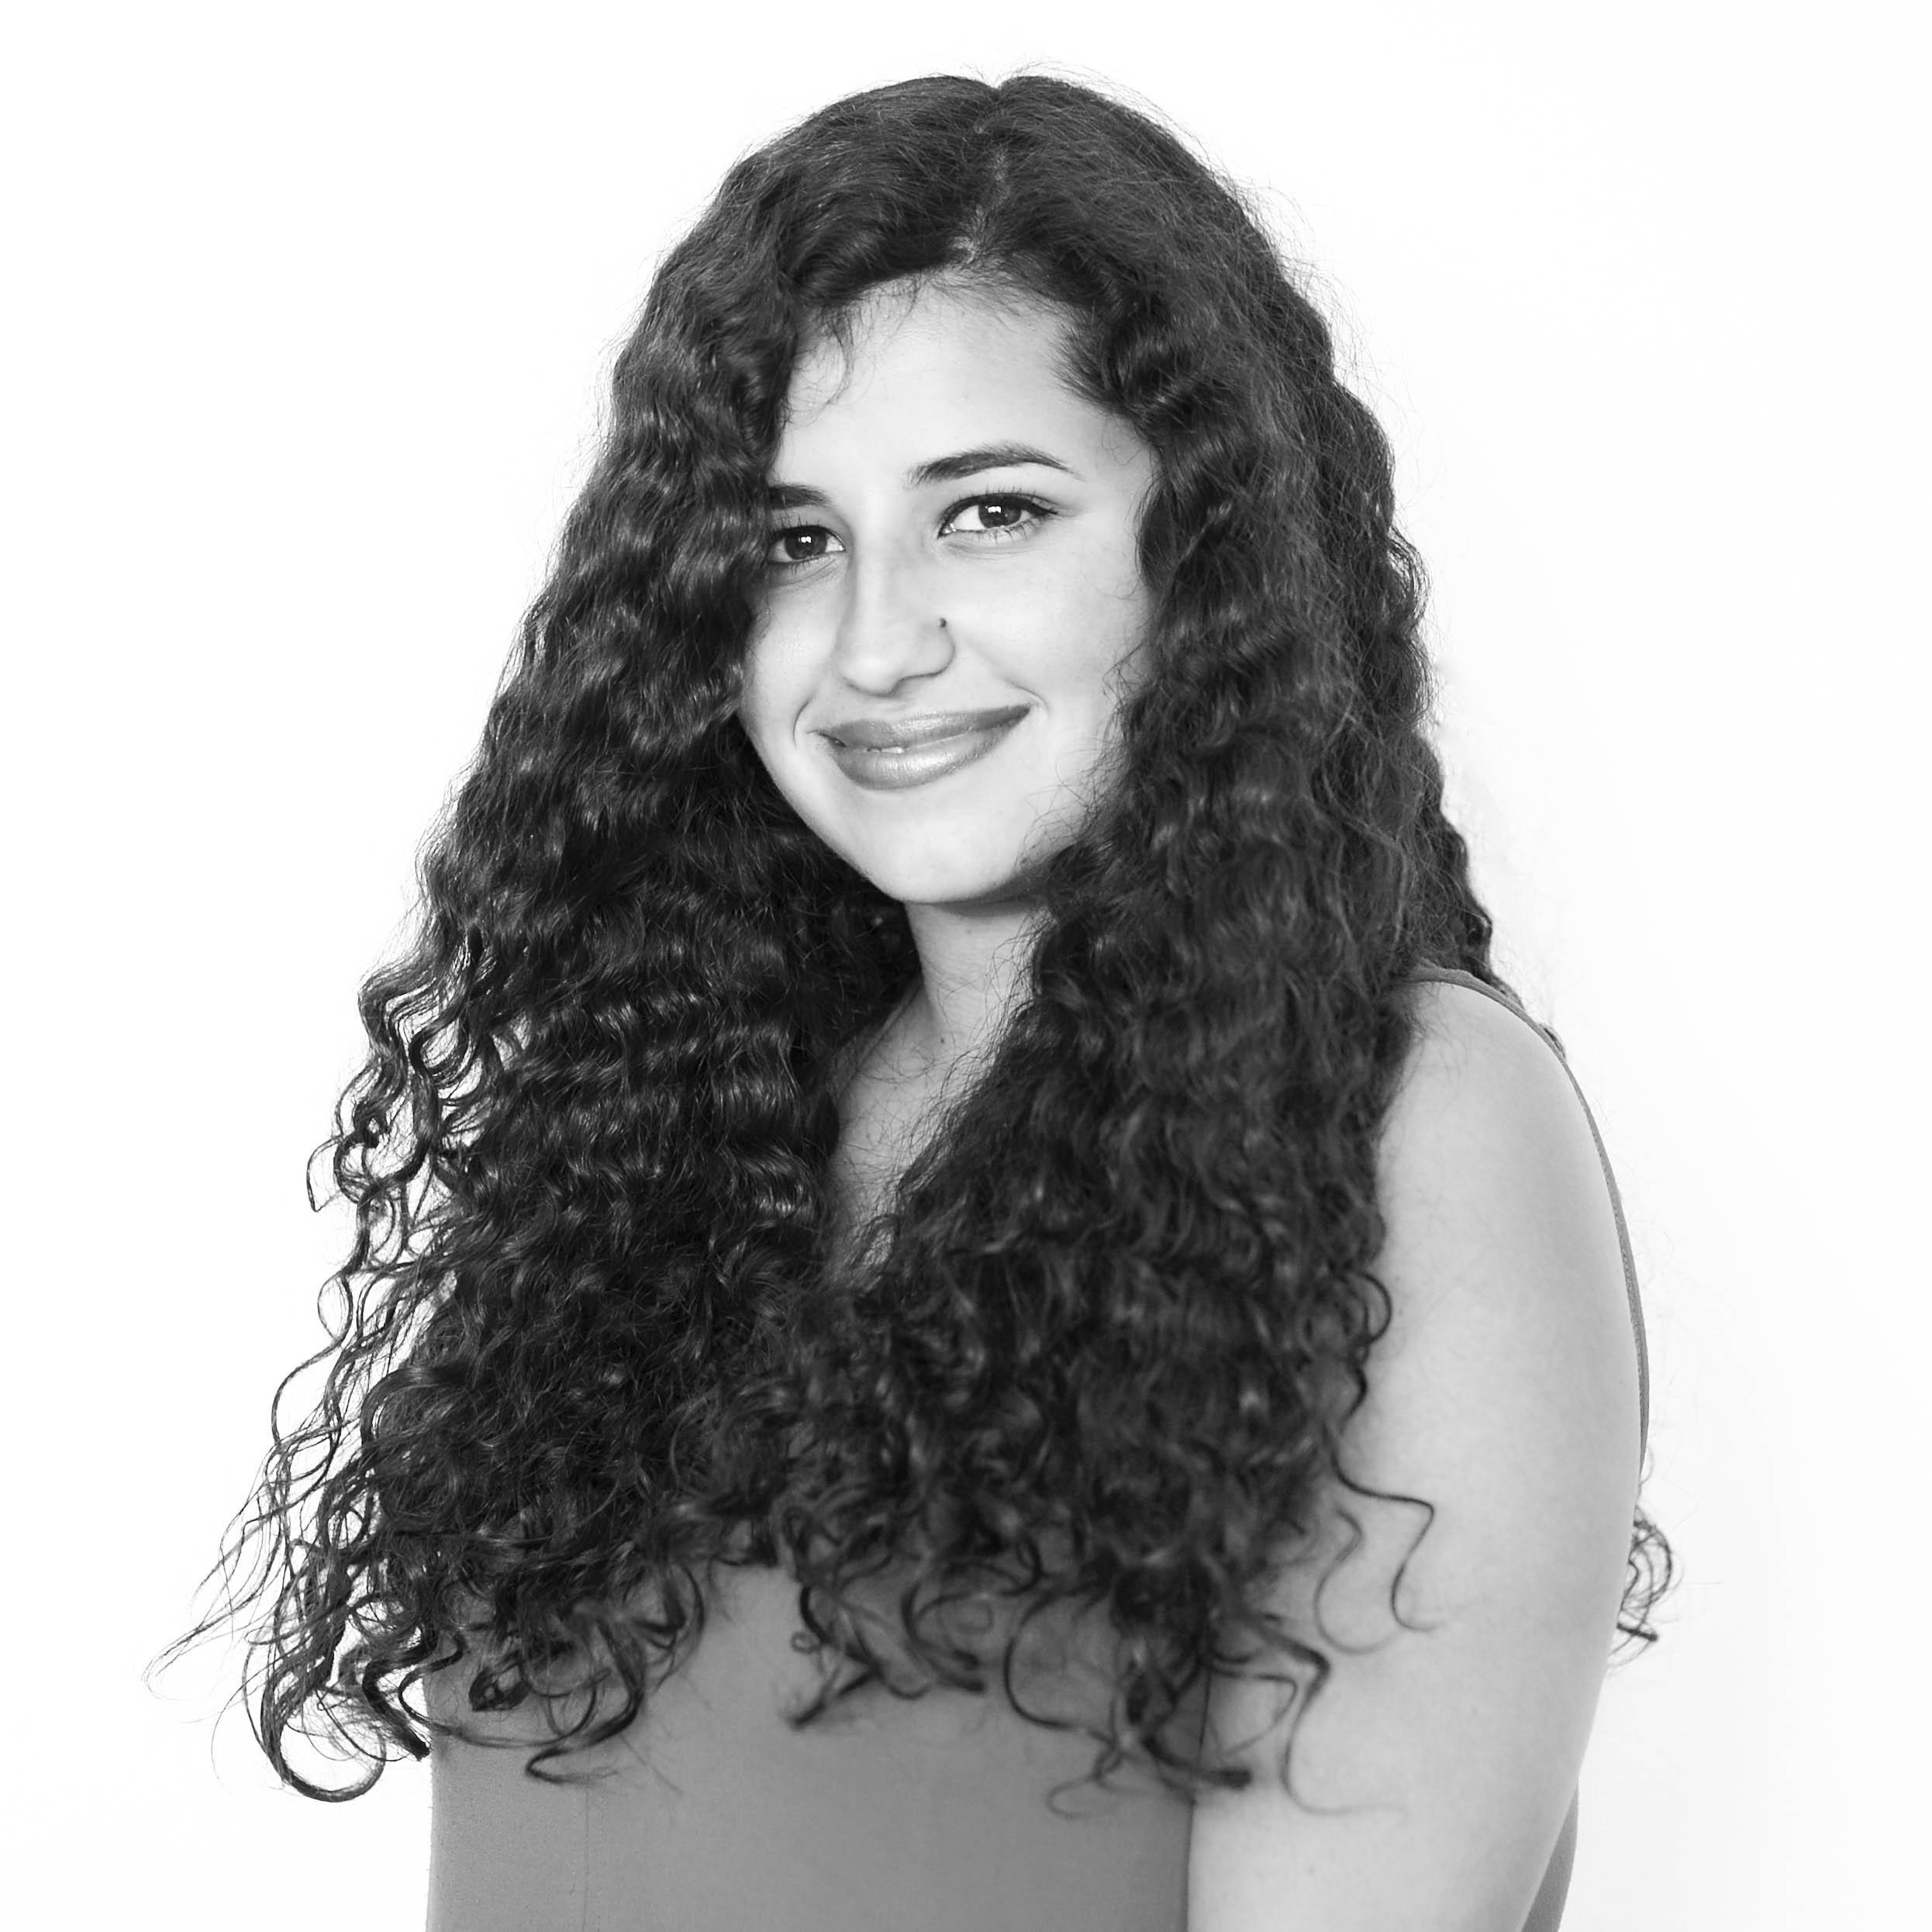 B&W brazilian girl portrait